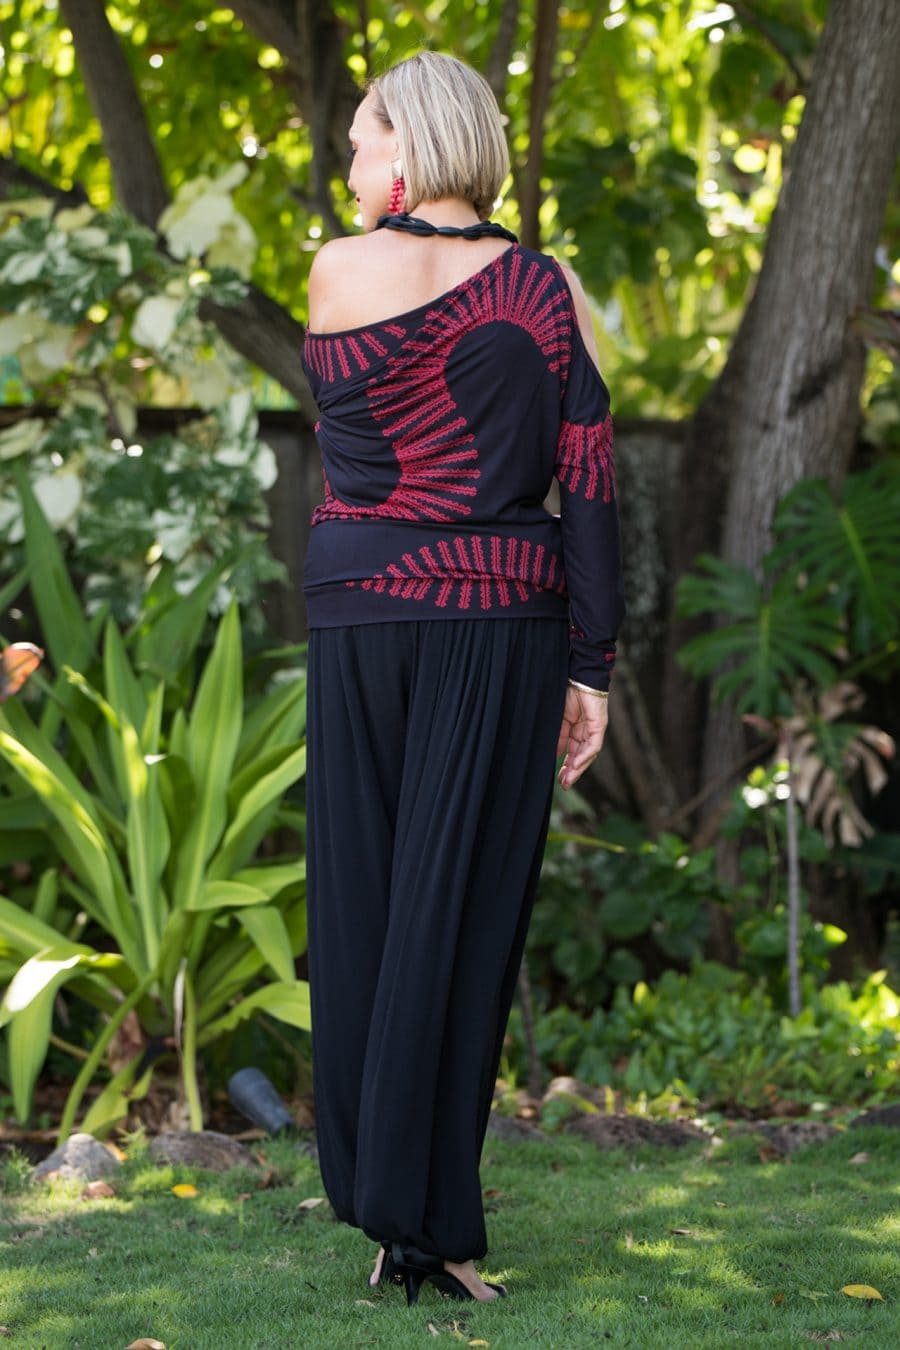 Model wearing Kipoohiwi Top in Deepwell Brick Red Lalani Kalalea Pattern - Back View